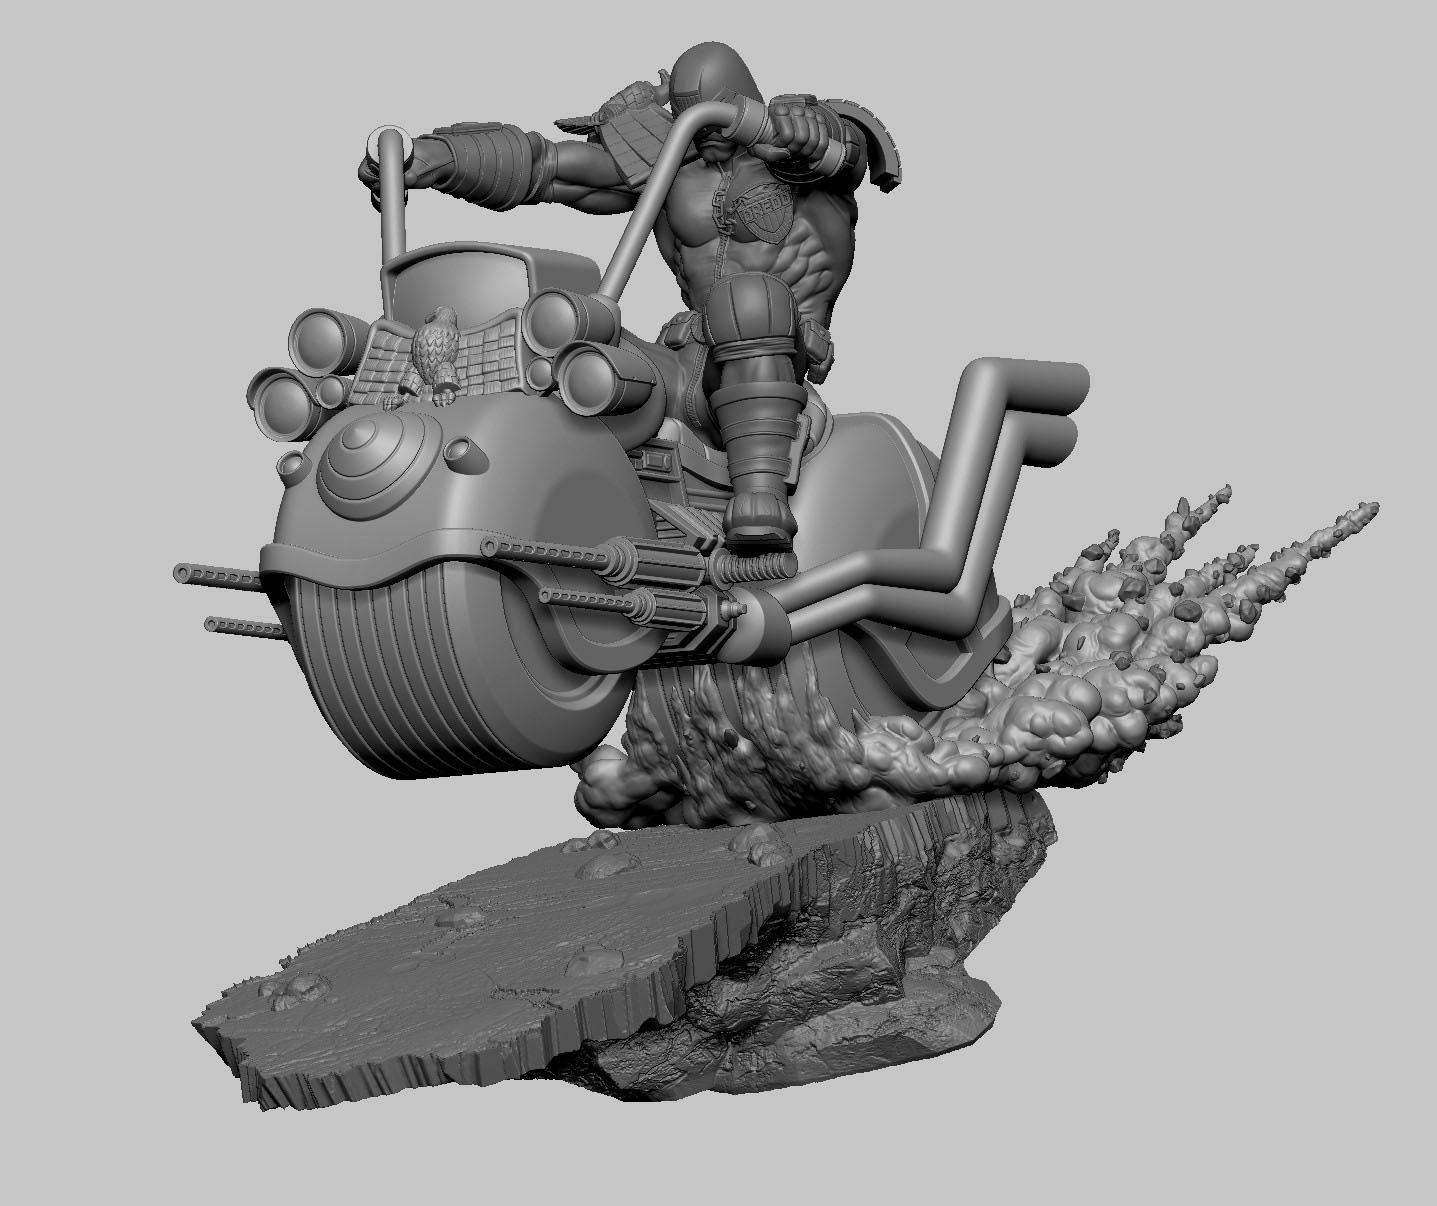 [Pop Culture Shock] Judge Dredd On Motorcycle statue - 1/5 Diorama Judge-Dredd-on-Motorcycle-PCS-Statue